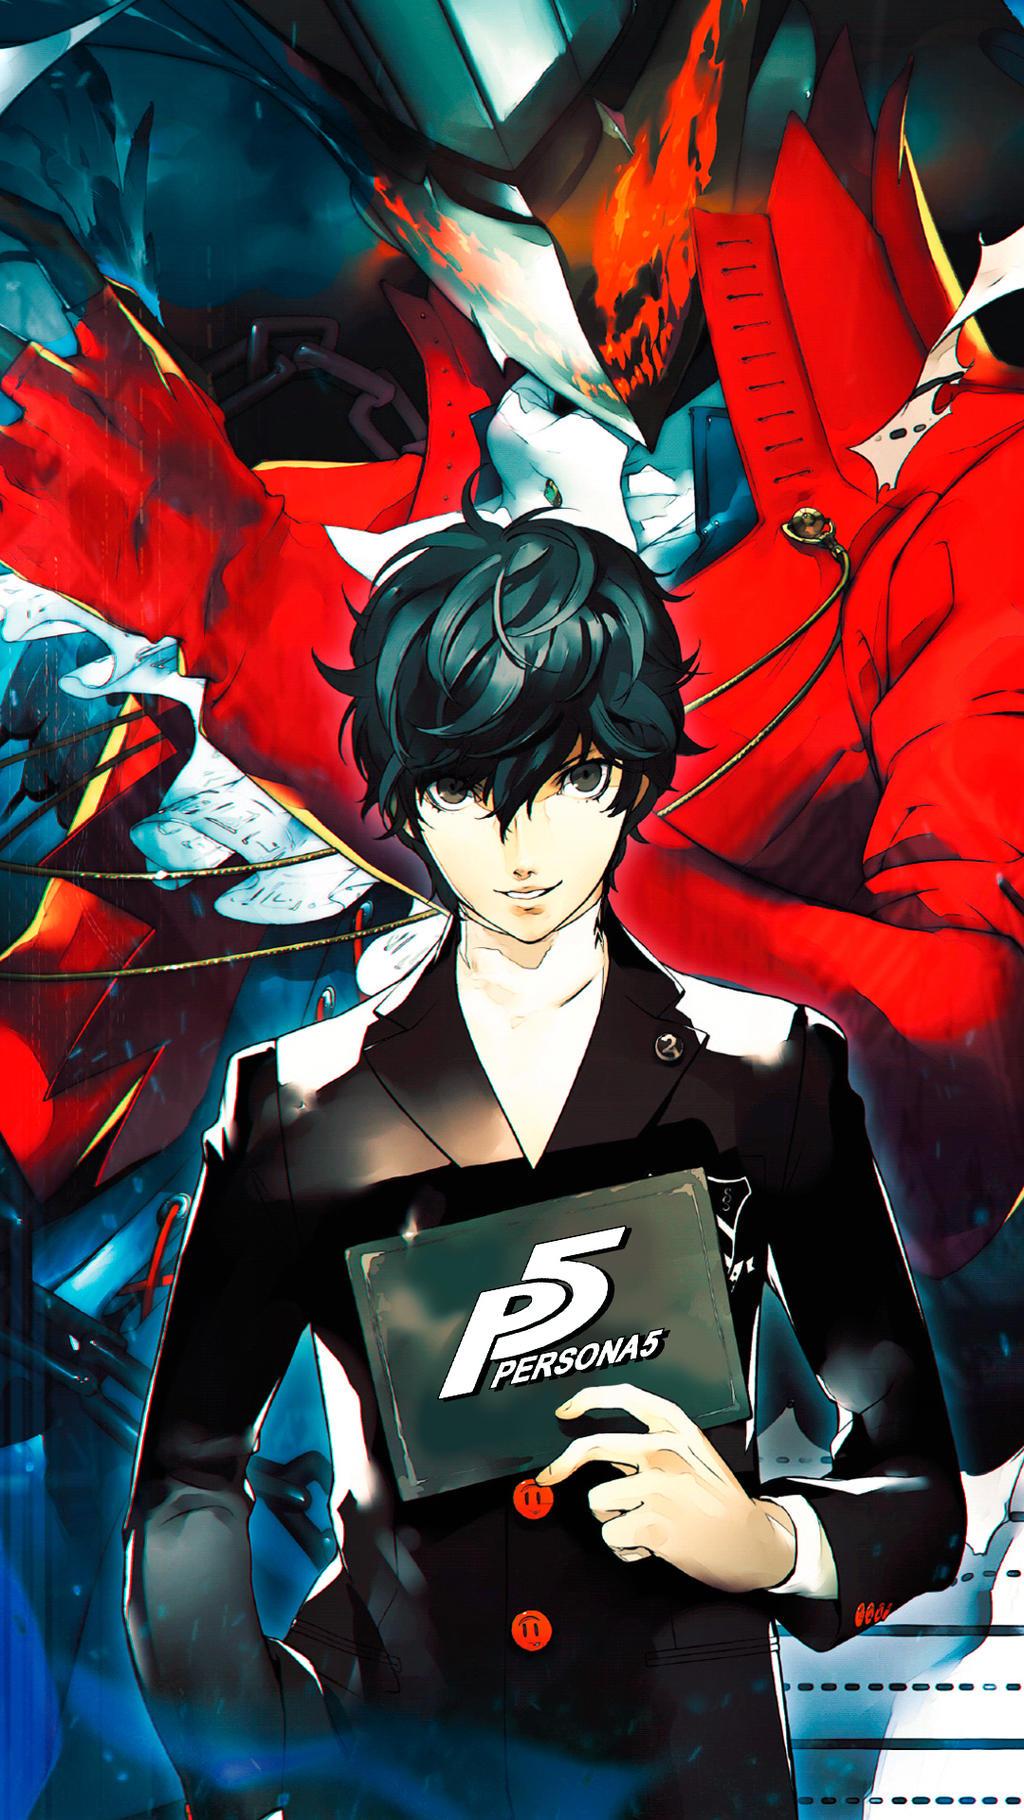 Persona 5 wallpaper for smartphone by De-monVarela on ...